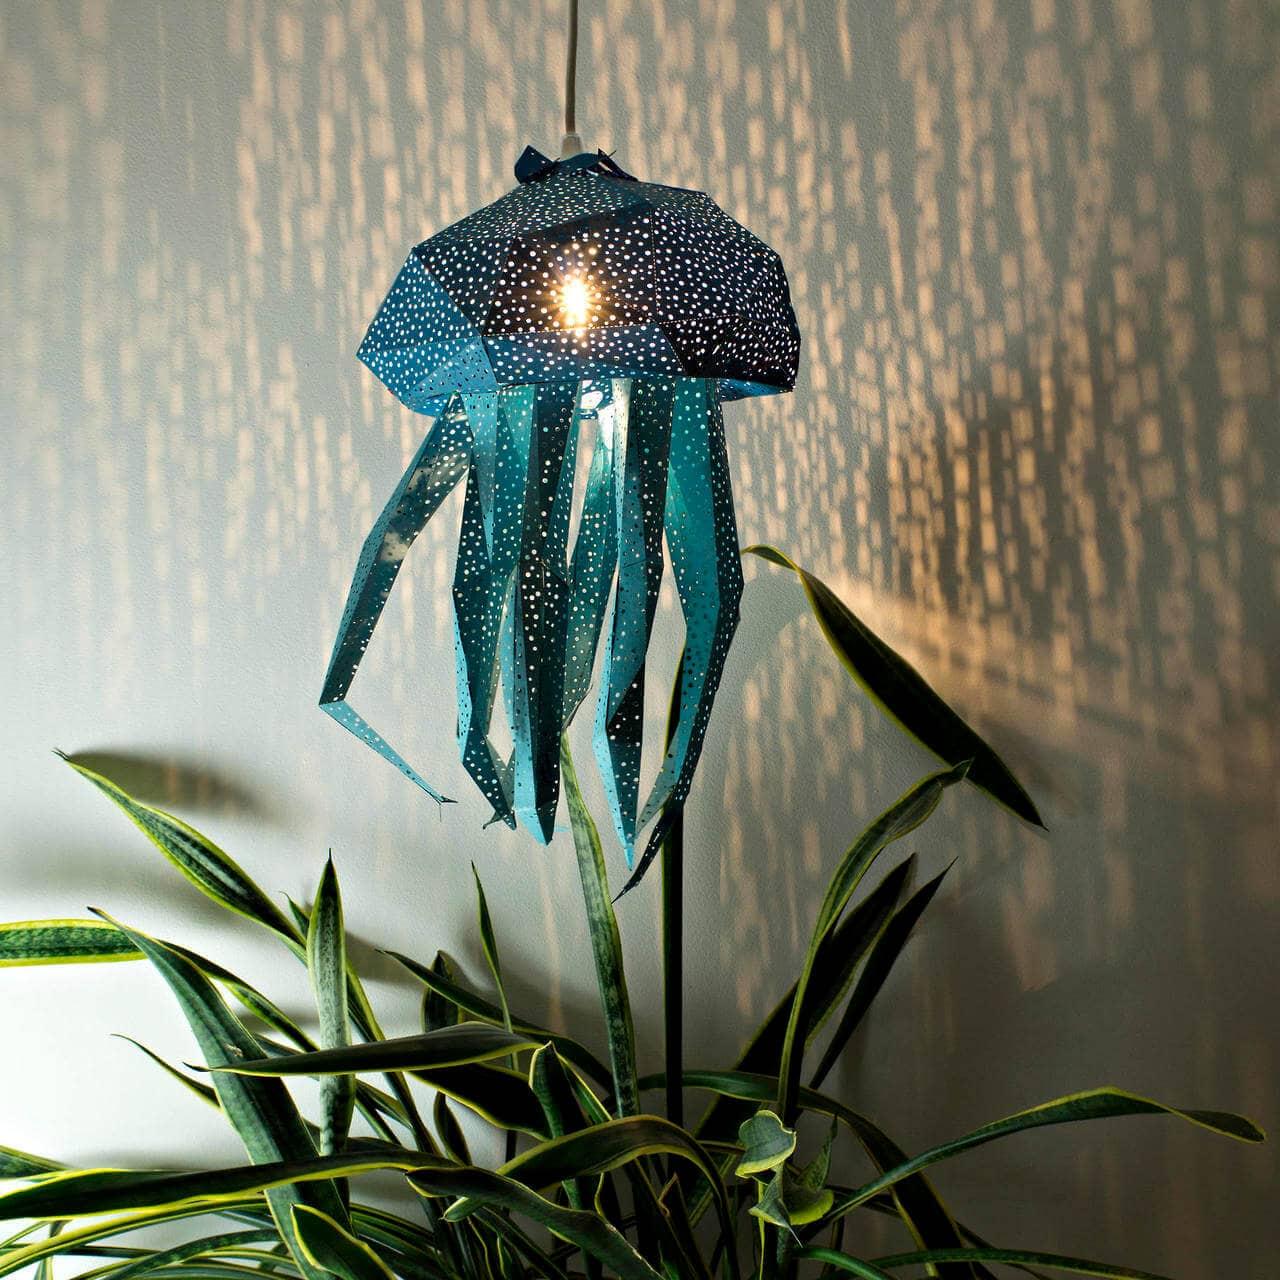 diy papercraft light shades vasili 5